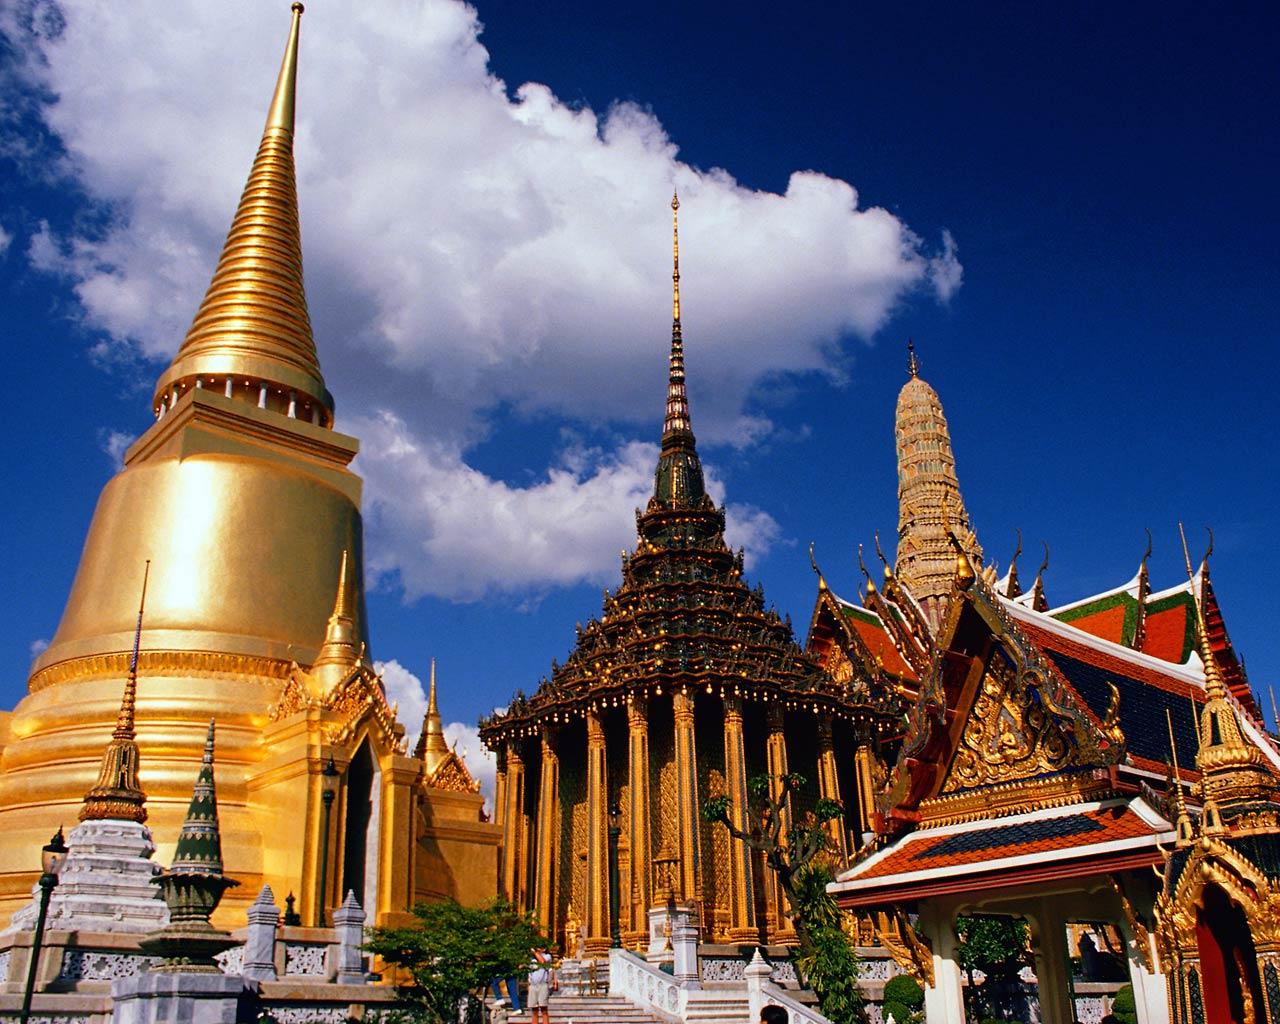 http://3.bp.blogspot.com/-5J73sj-9Cs8/TwNknwWdsjI/AAAAAAAACrU/zaPC8yBwACI/s1600/1301483351amazing_thailand.jpg